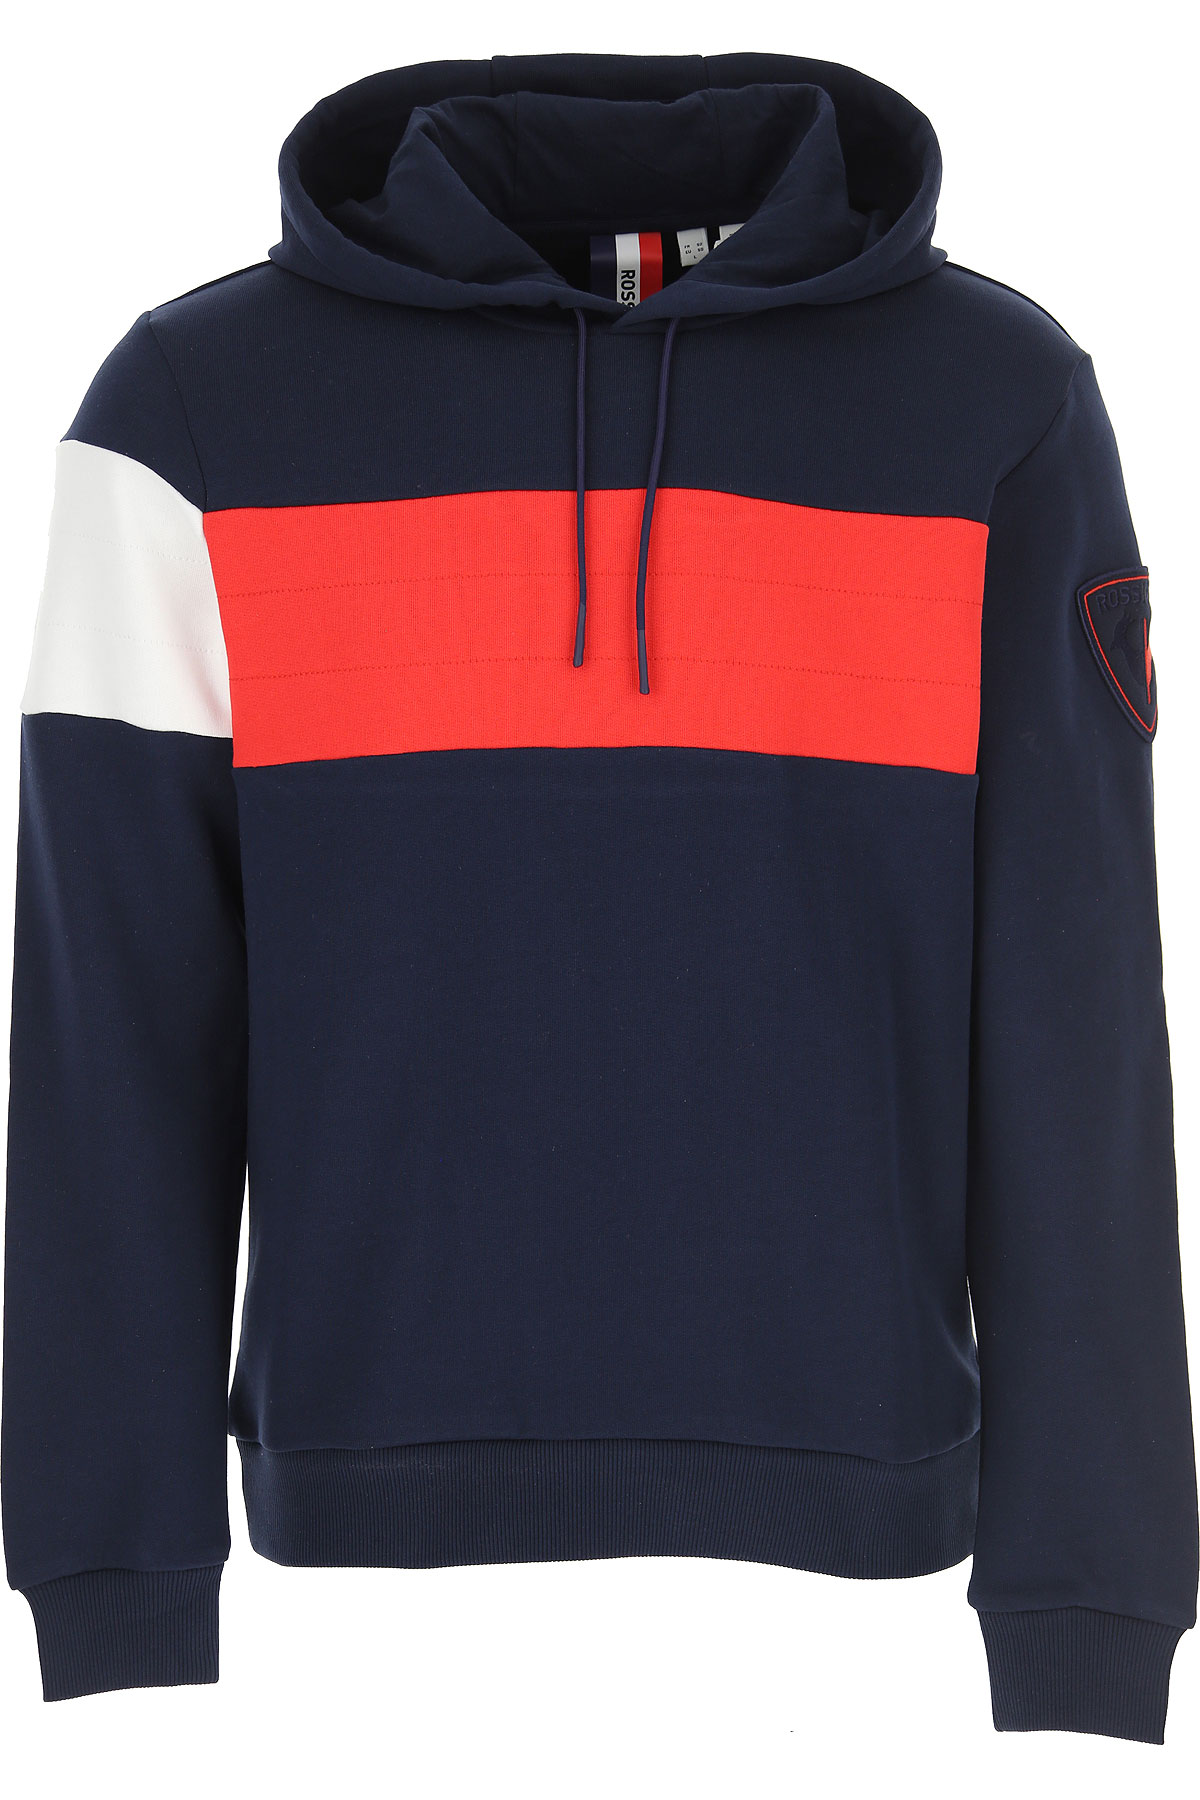 Rossignol Sweatshirt for Men On Sale, Navy Blue, Cotton, 2019, L M S XL